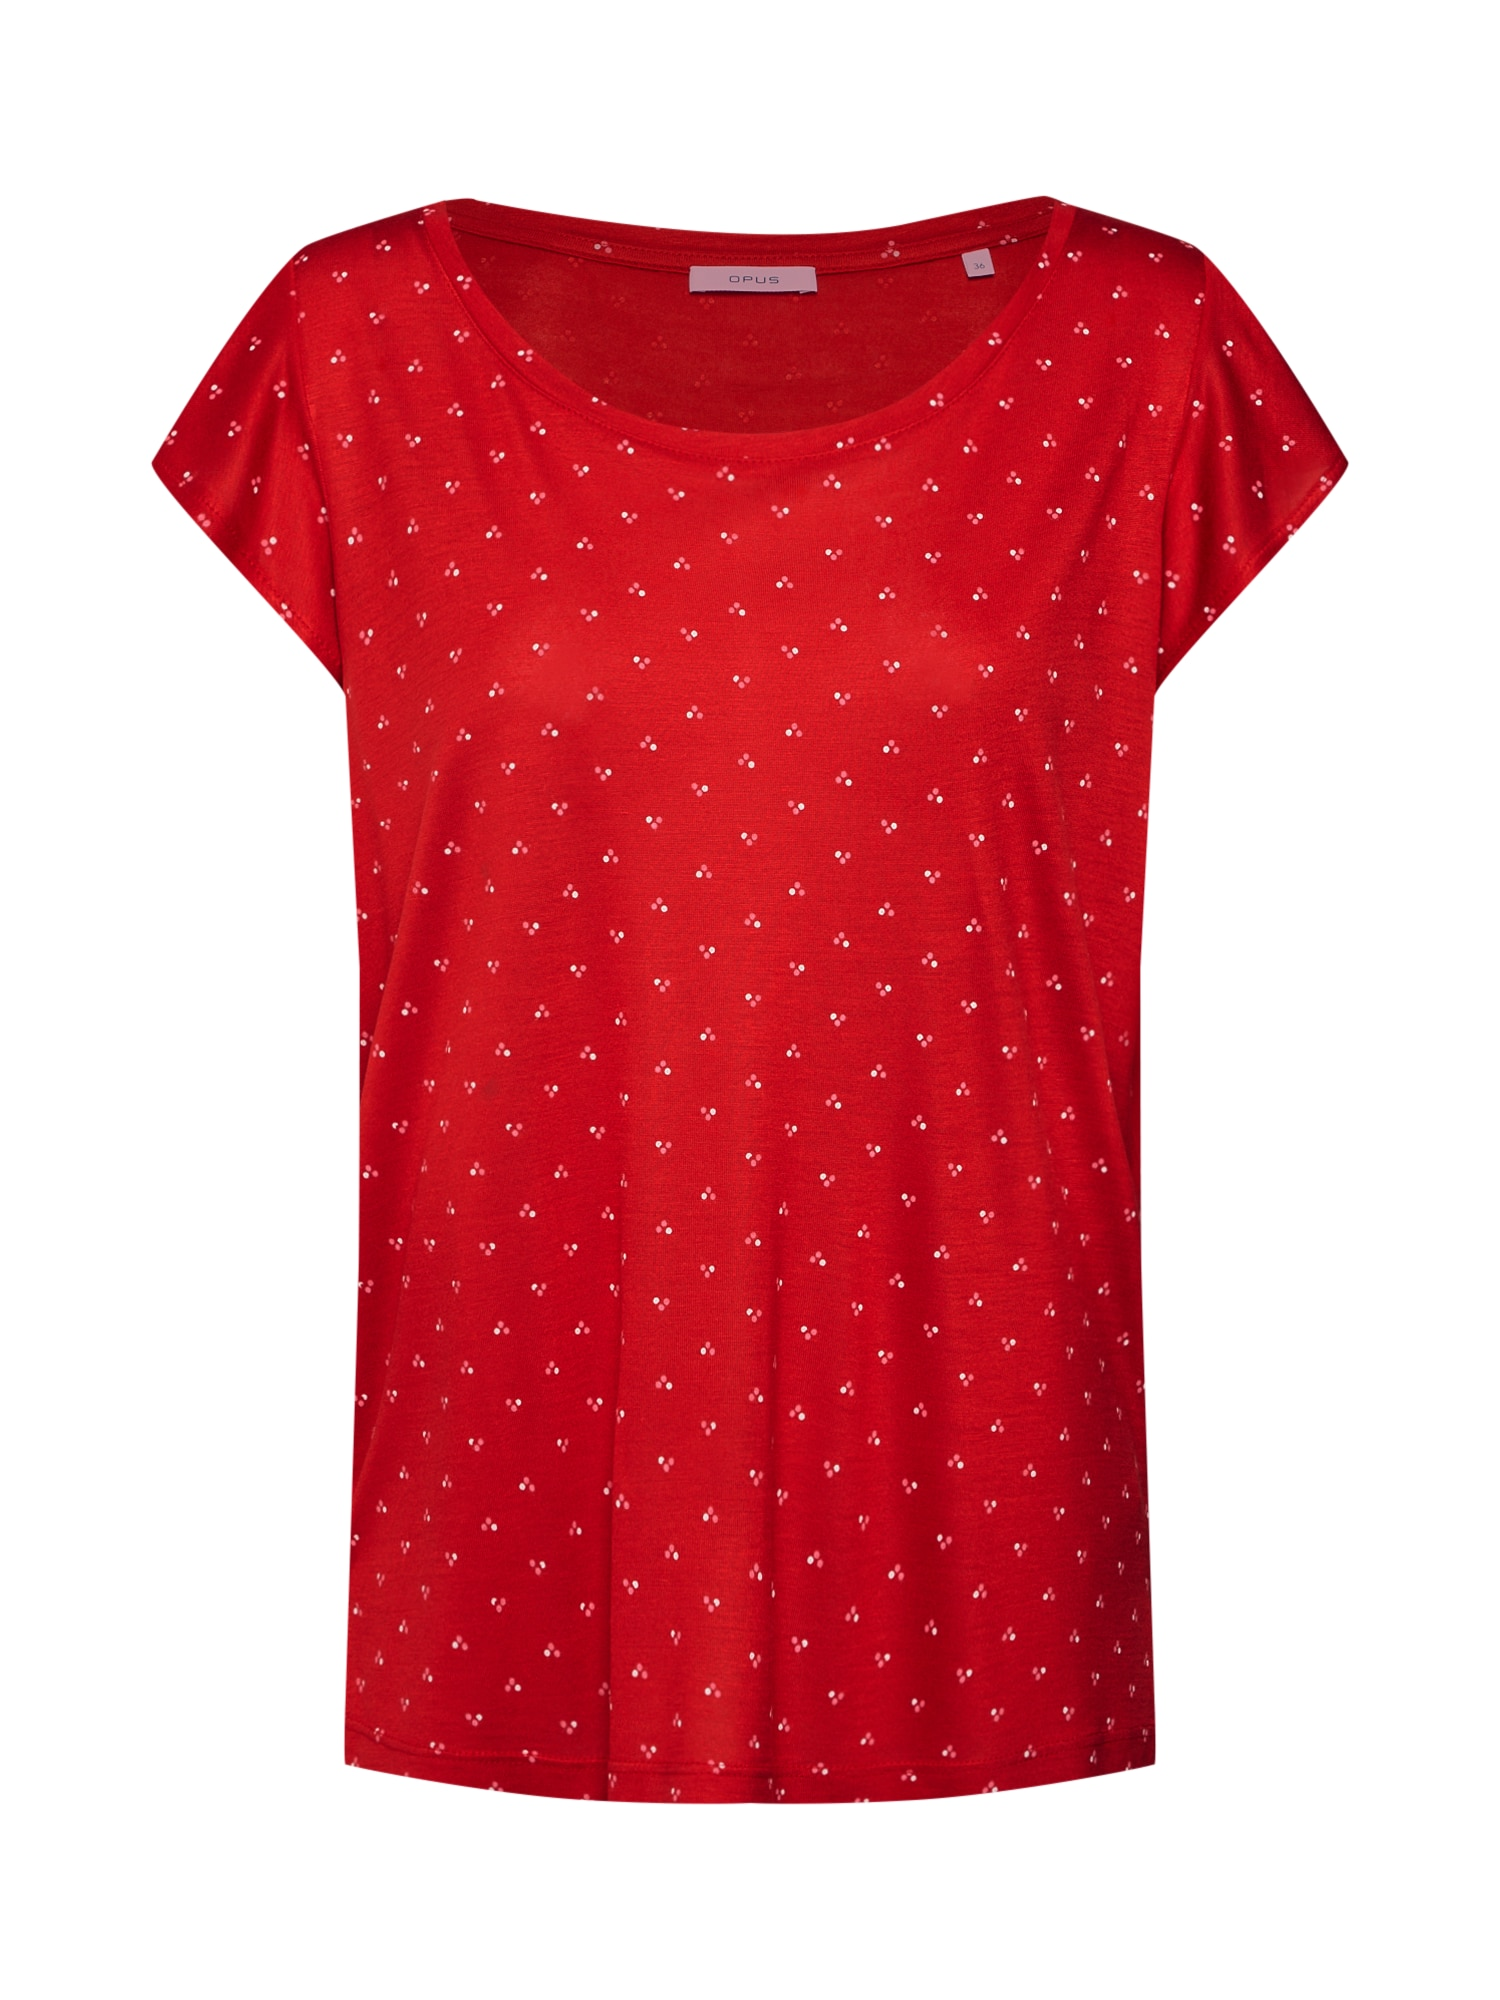 Tričko Solliana threedots ROS červená bílá OPUS